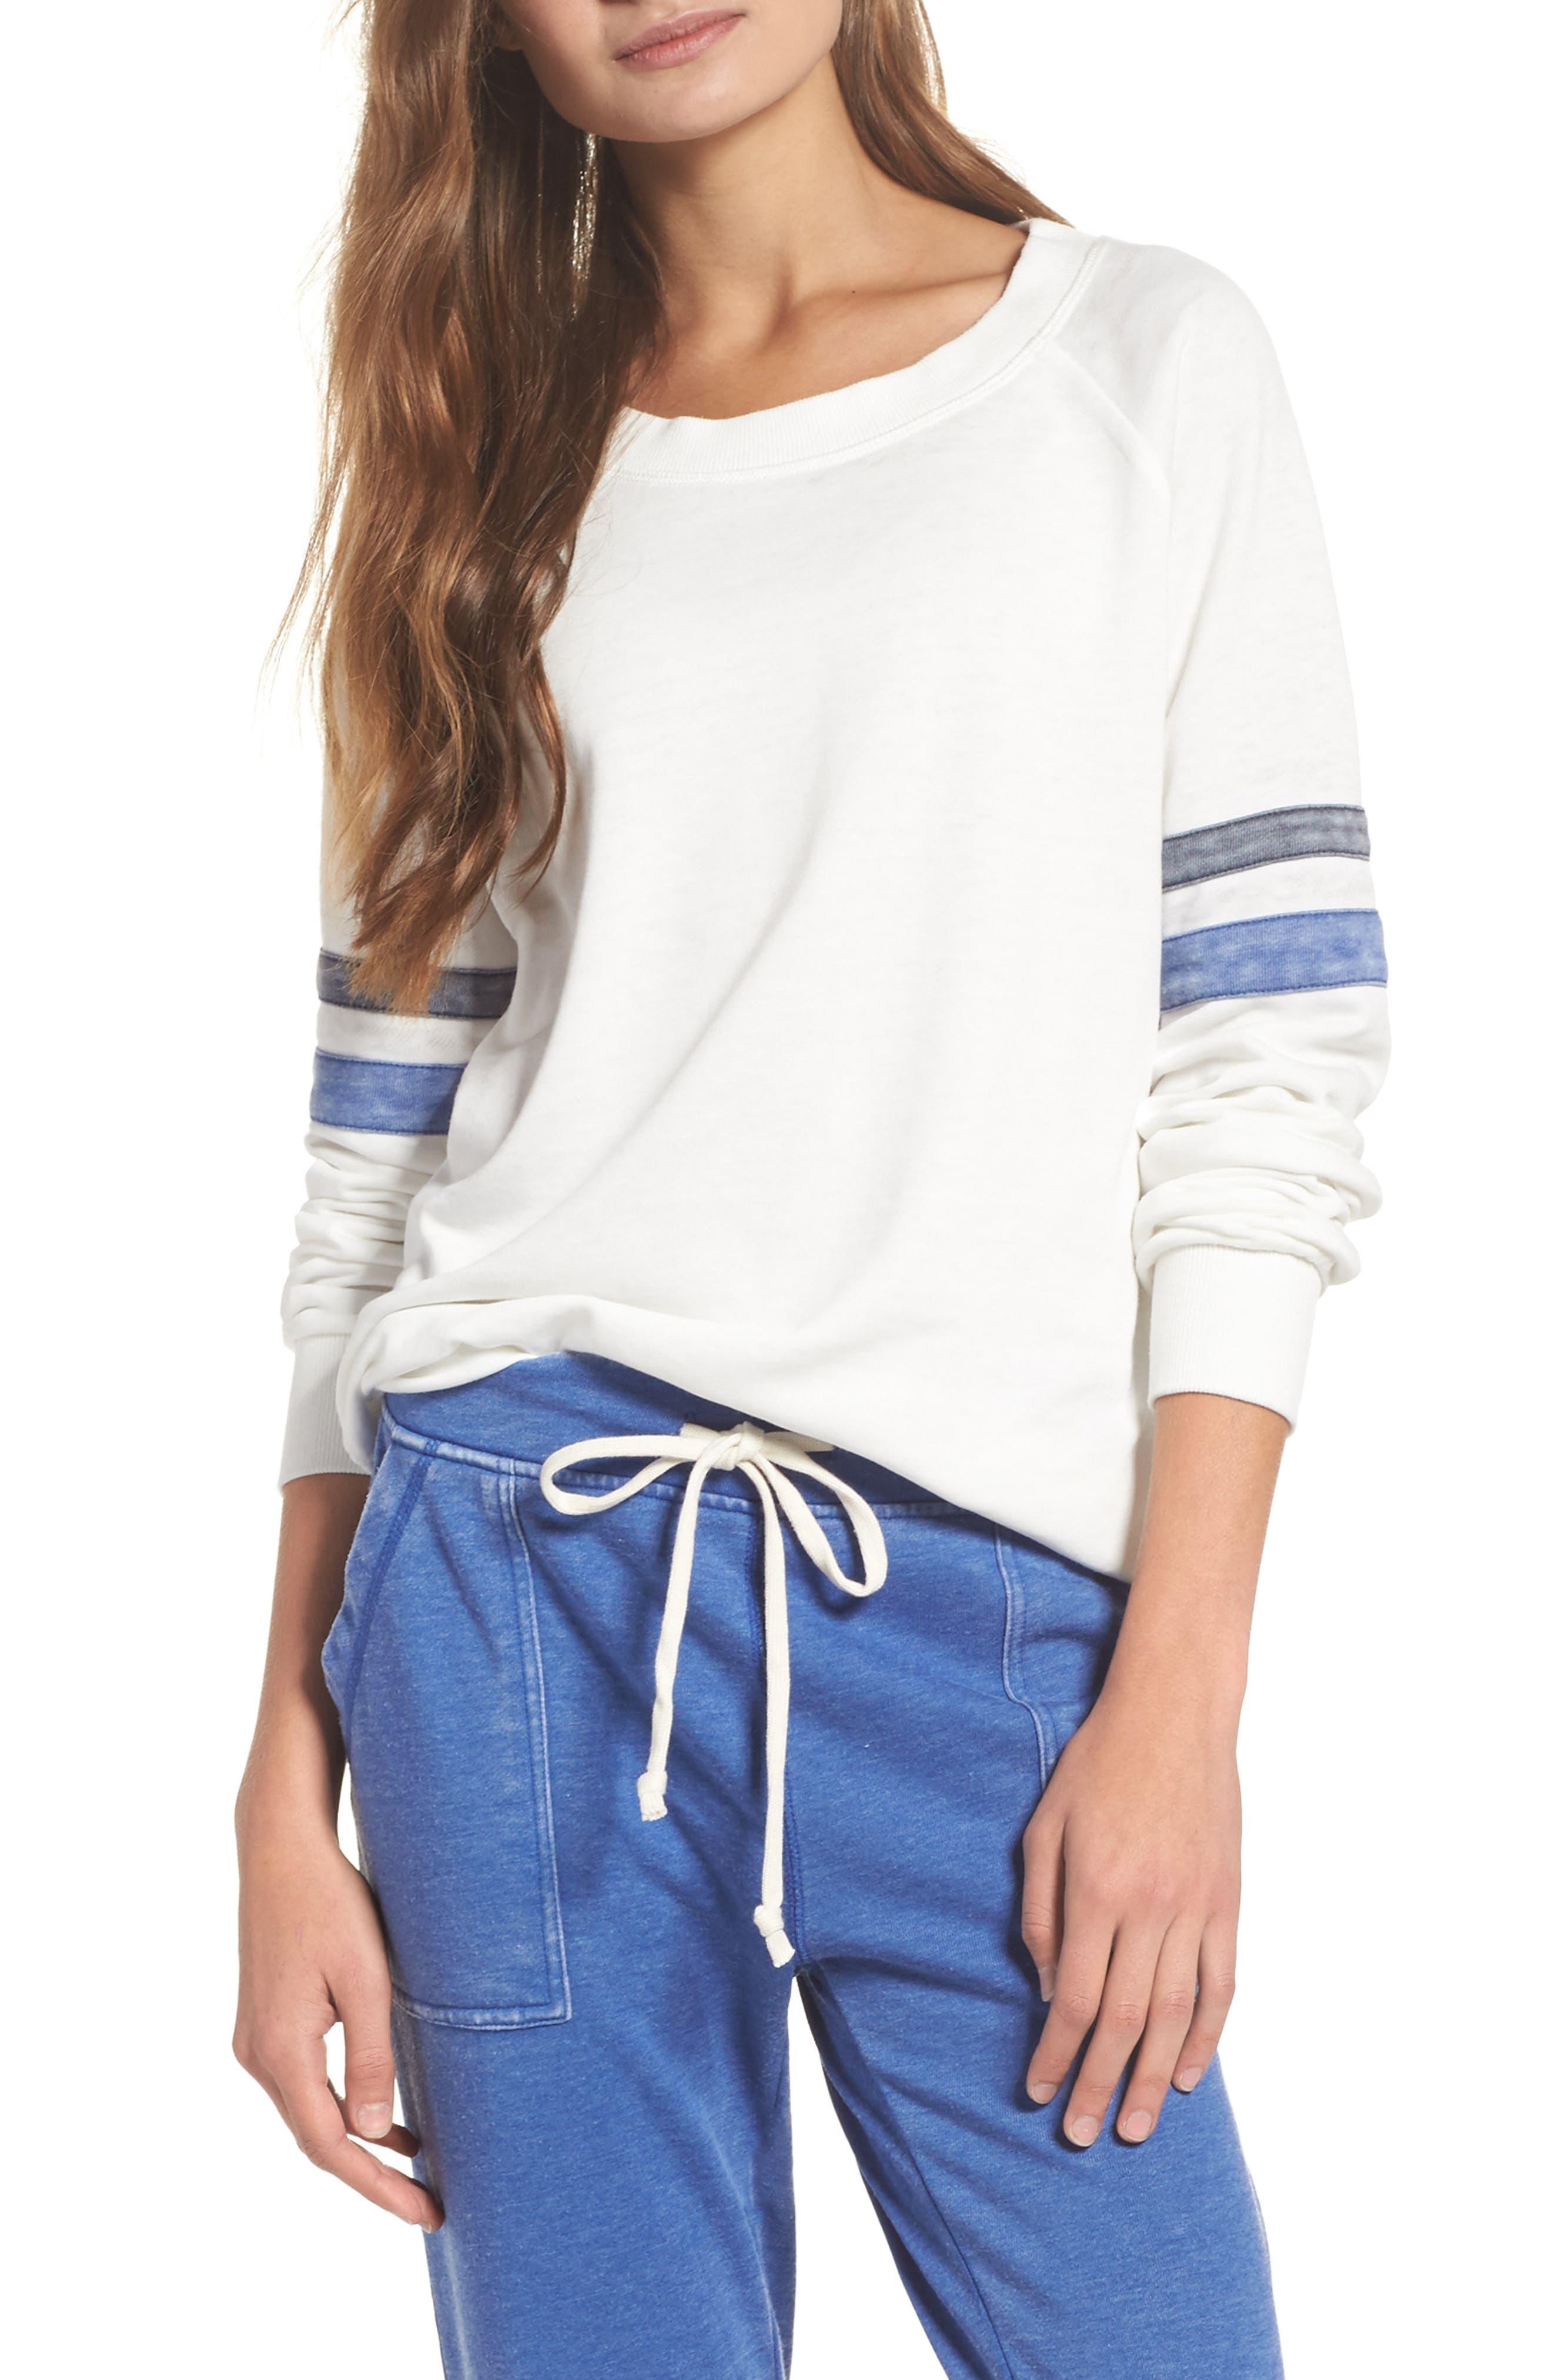 Lazy Day Sweatshirt,                         Main,                         color, Ivory/ Dark Navy/ Pacific Blue